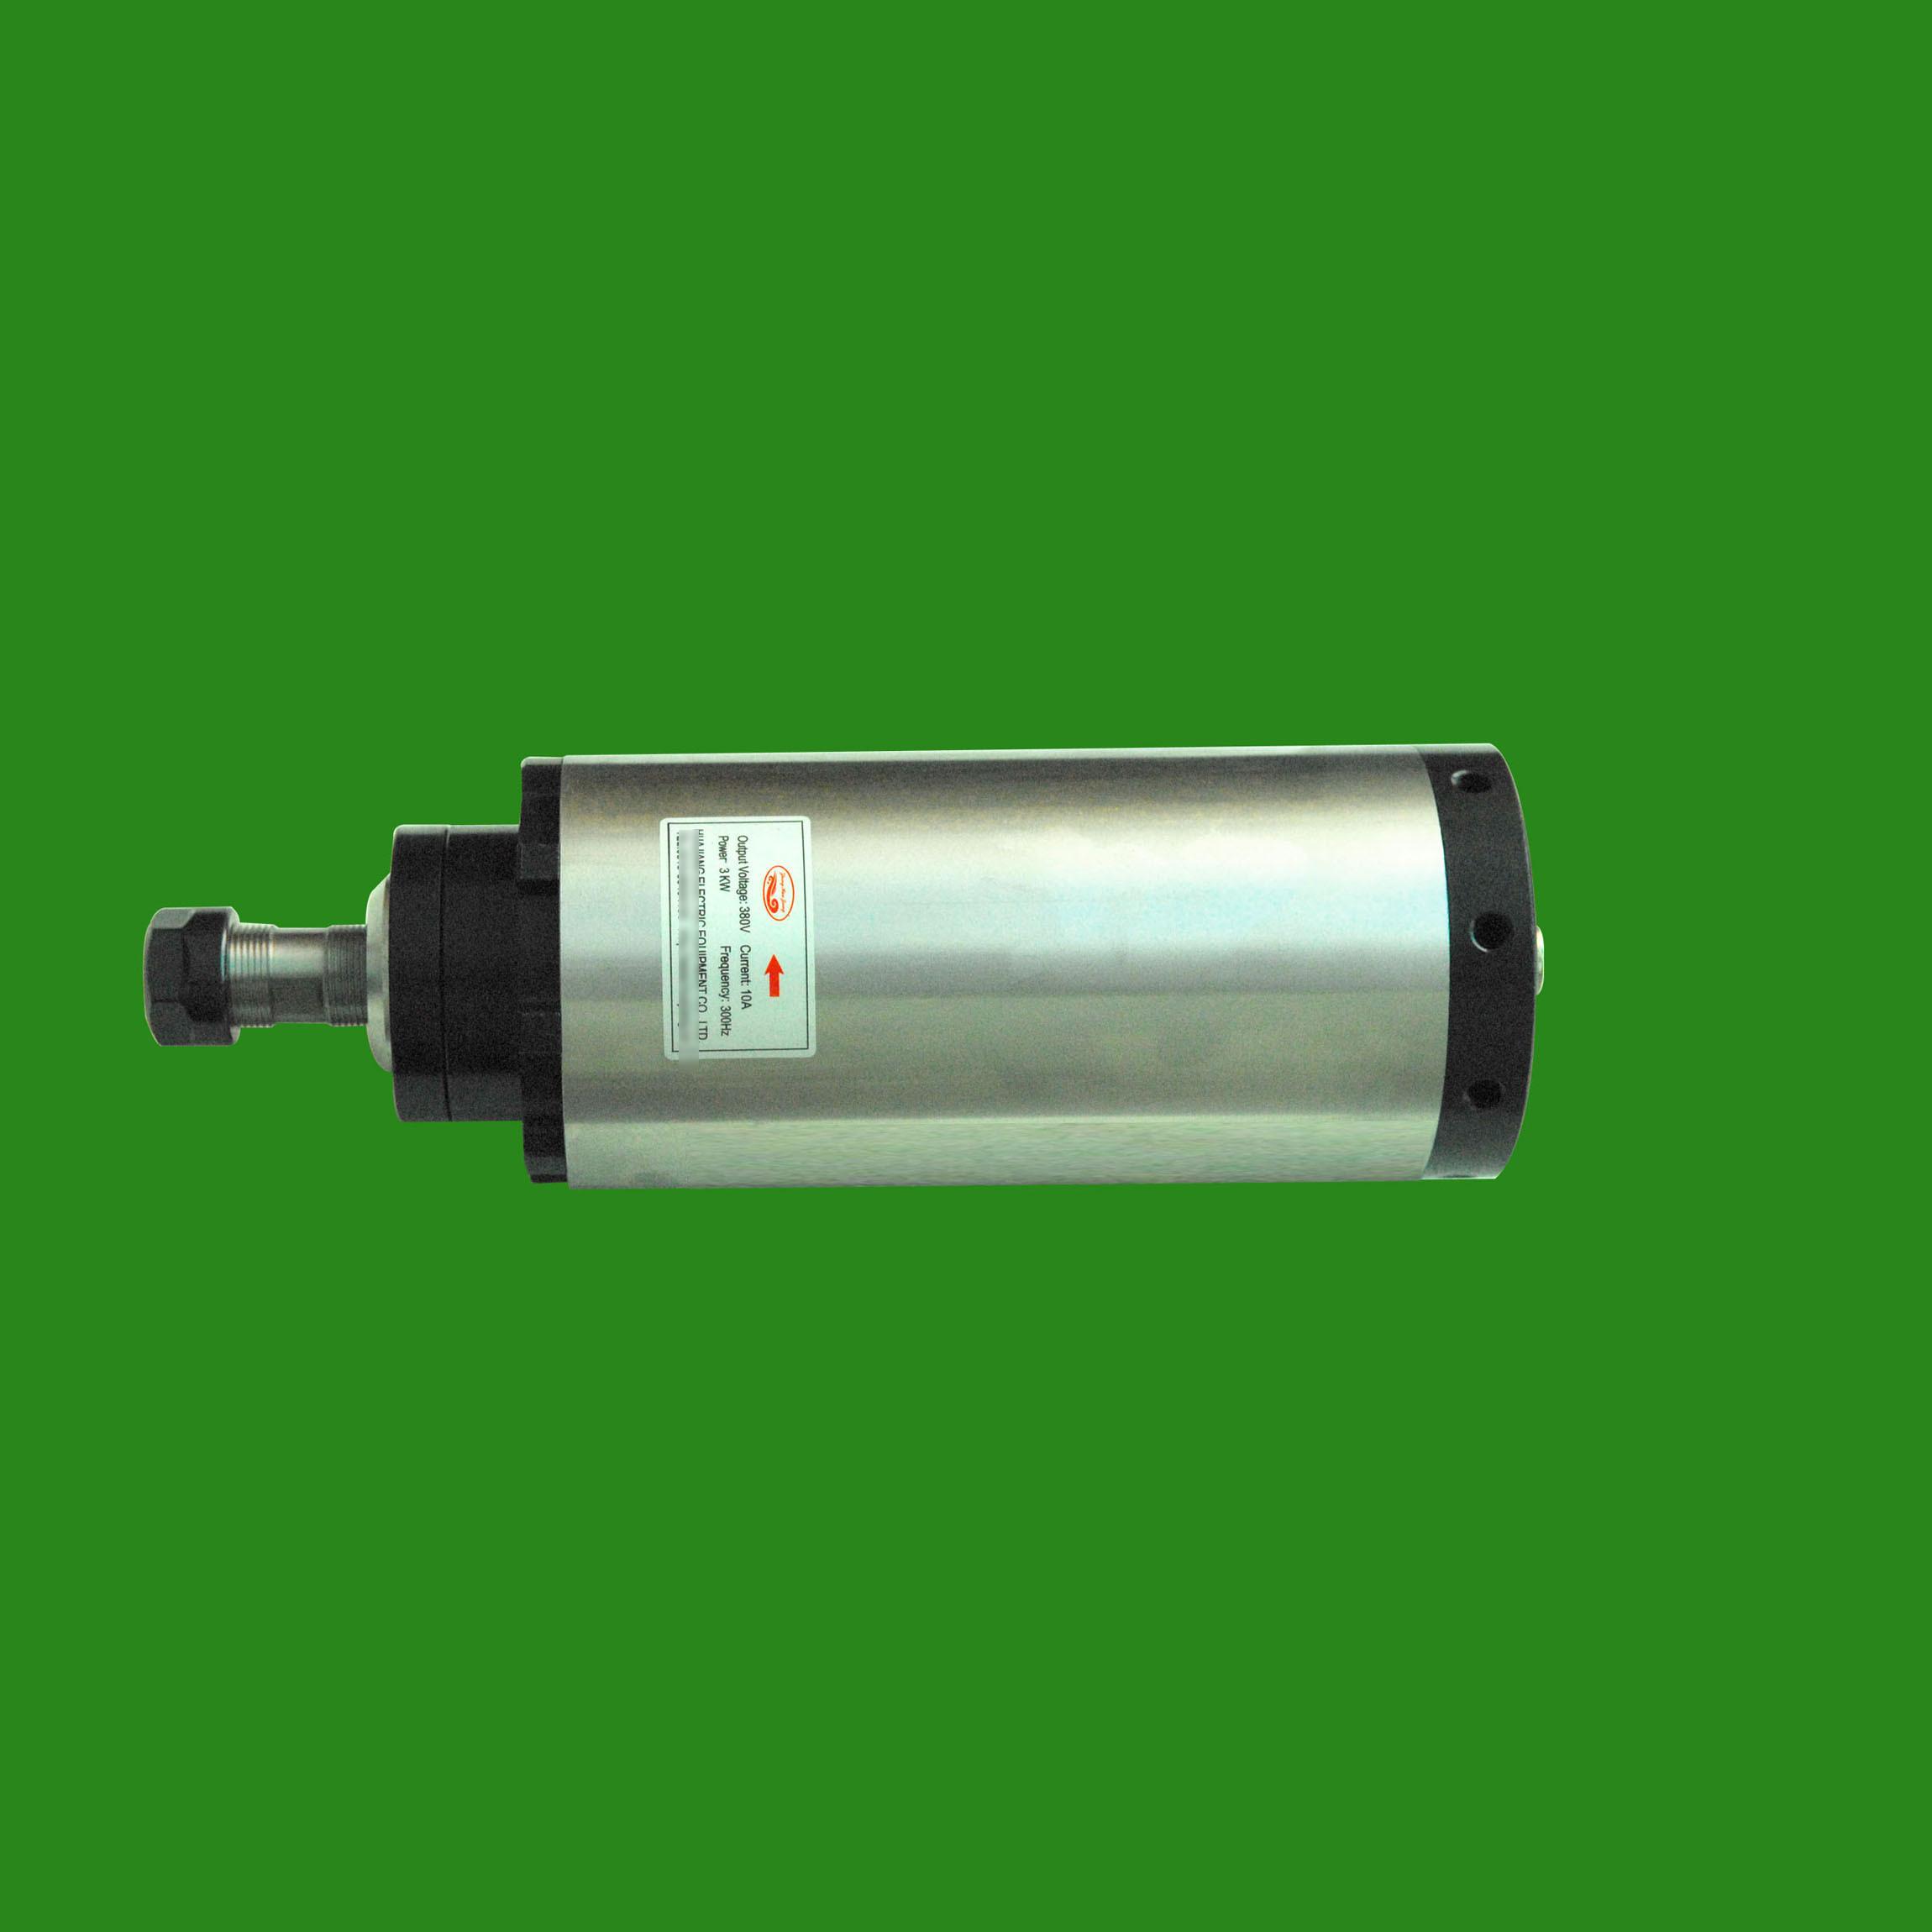 China high speed cnc spindle motor china spindle high for High speed spindle motors